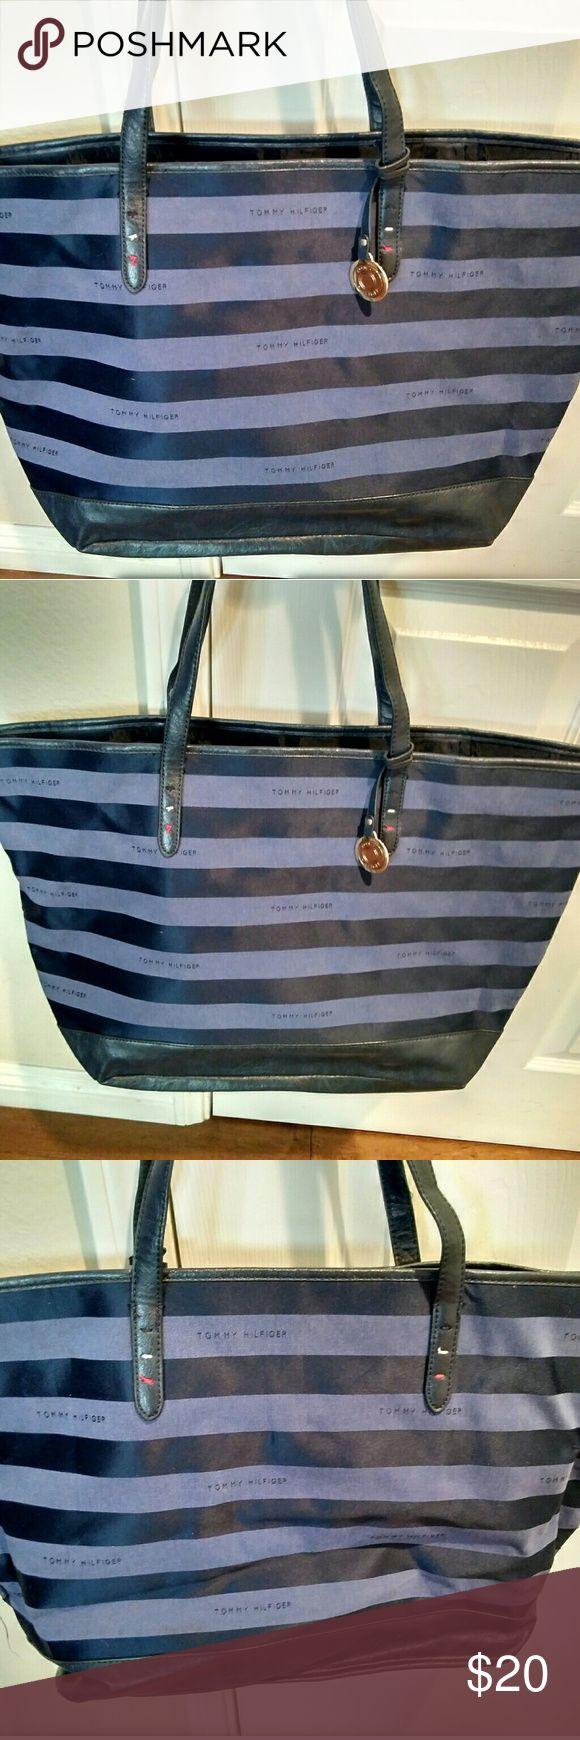 I just added this listing on Poshmark: Tommy Hilfiger signature tote bag purse. #shopmycloset #poshmark #fashion #shopping #style #forsale #Tommy Hilfiger #Handbags